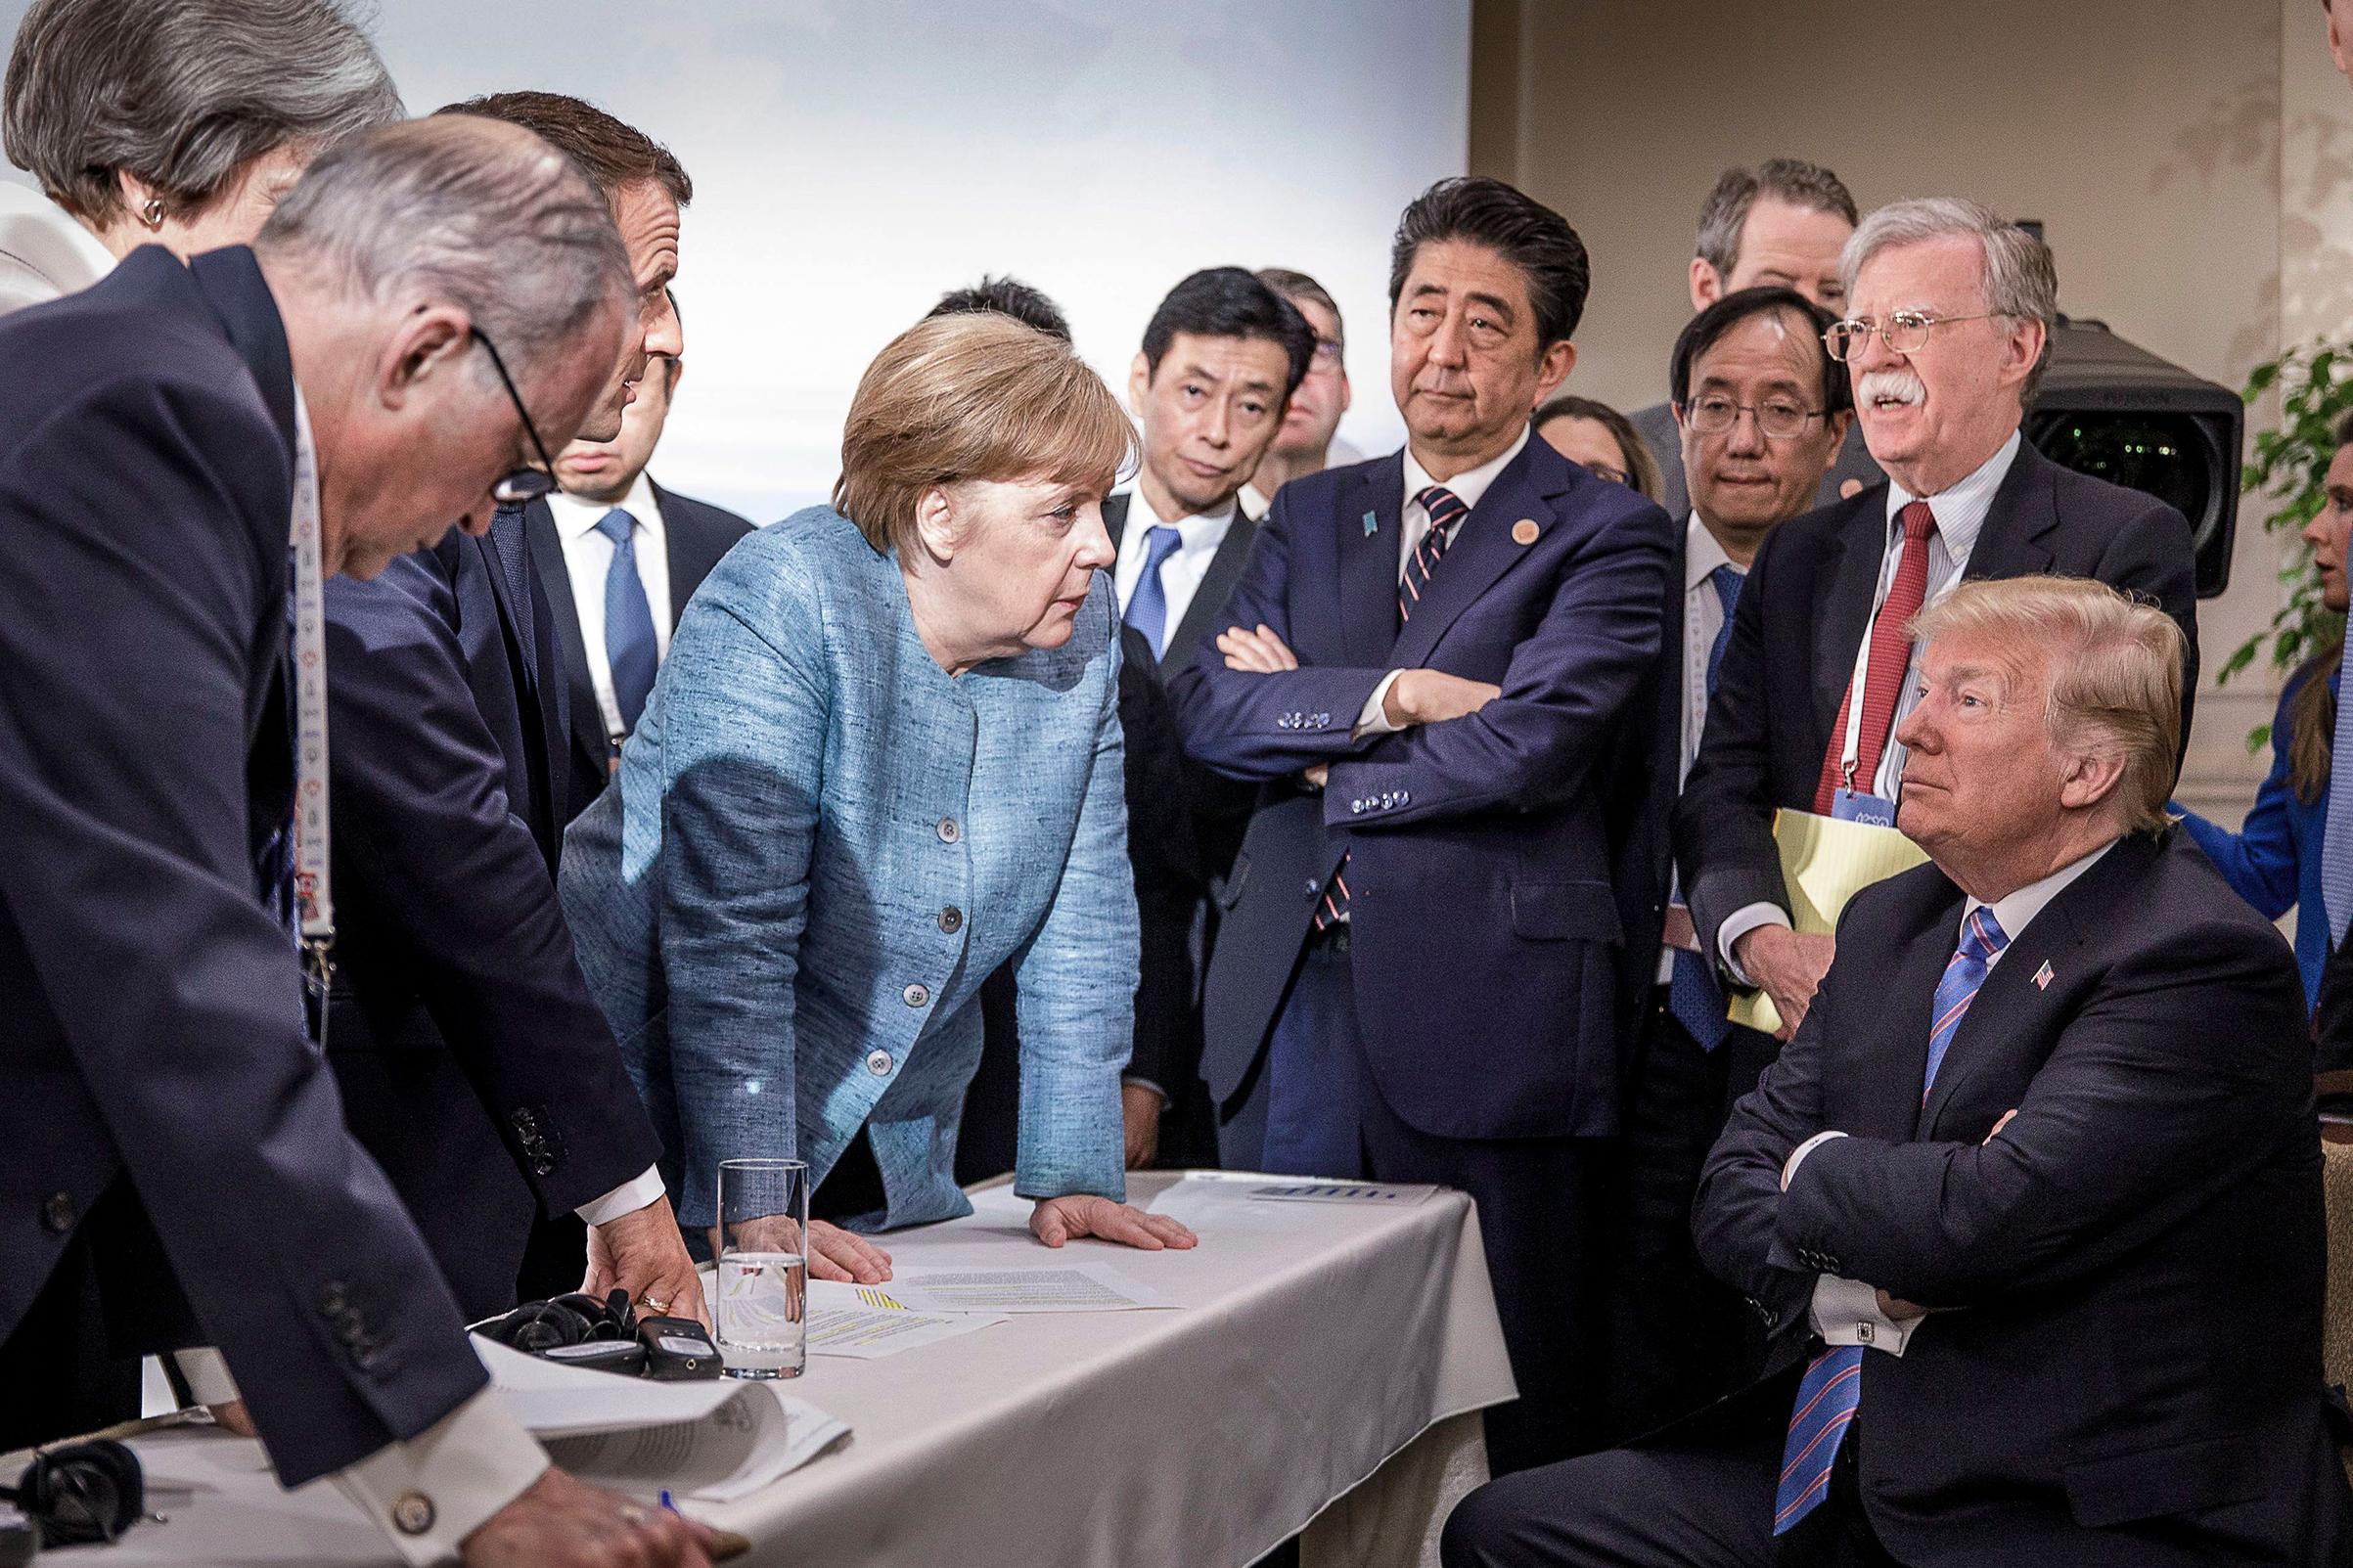 donald-trump-angela-merkel-g7-summit.jpg